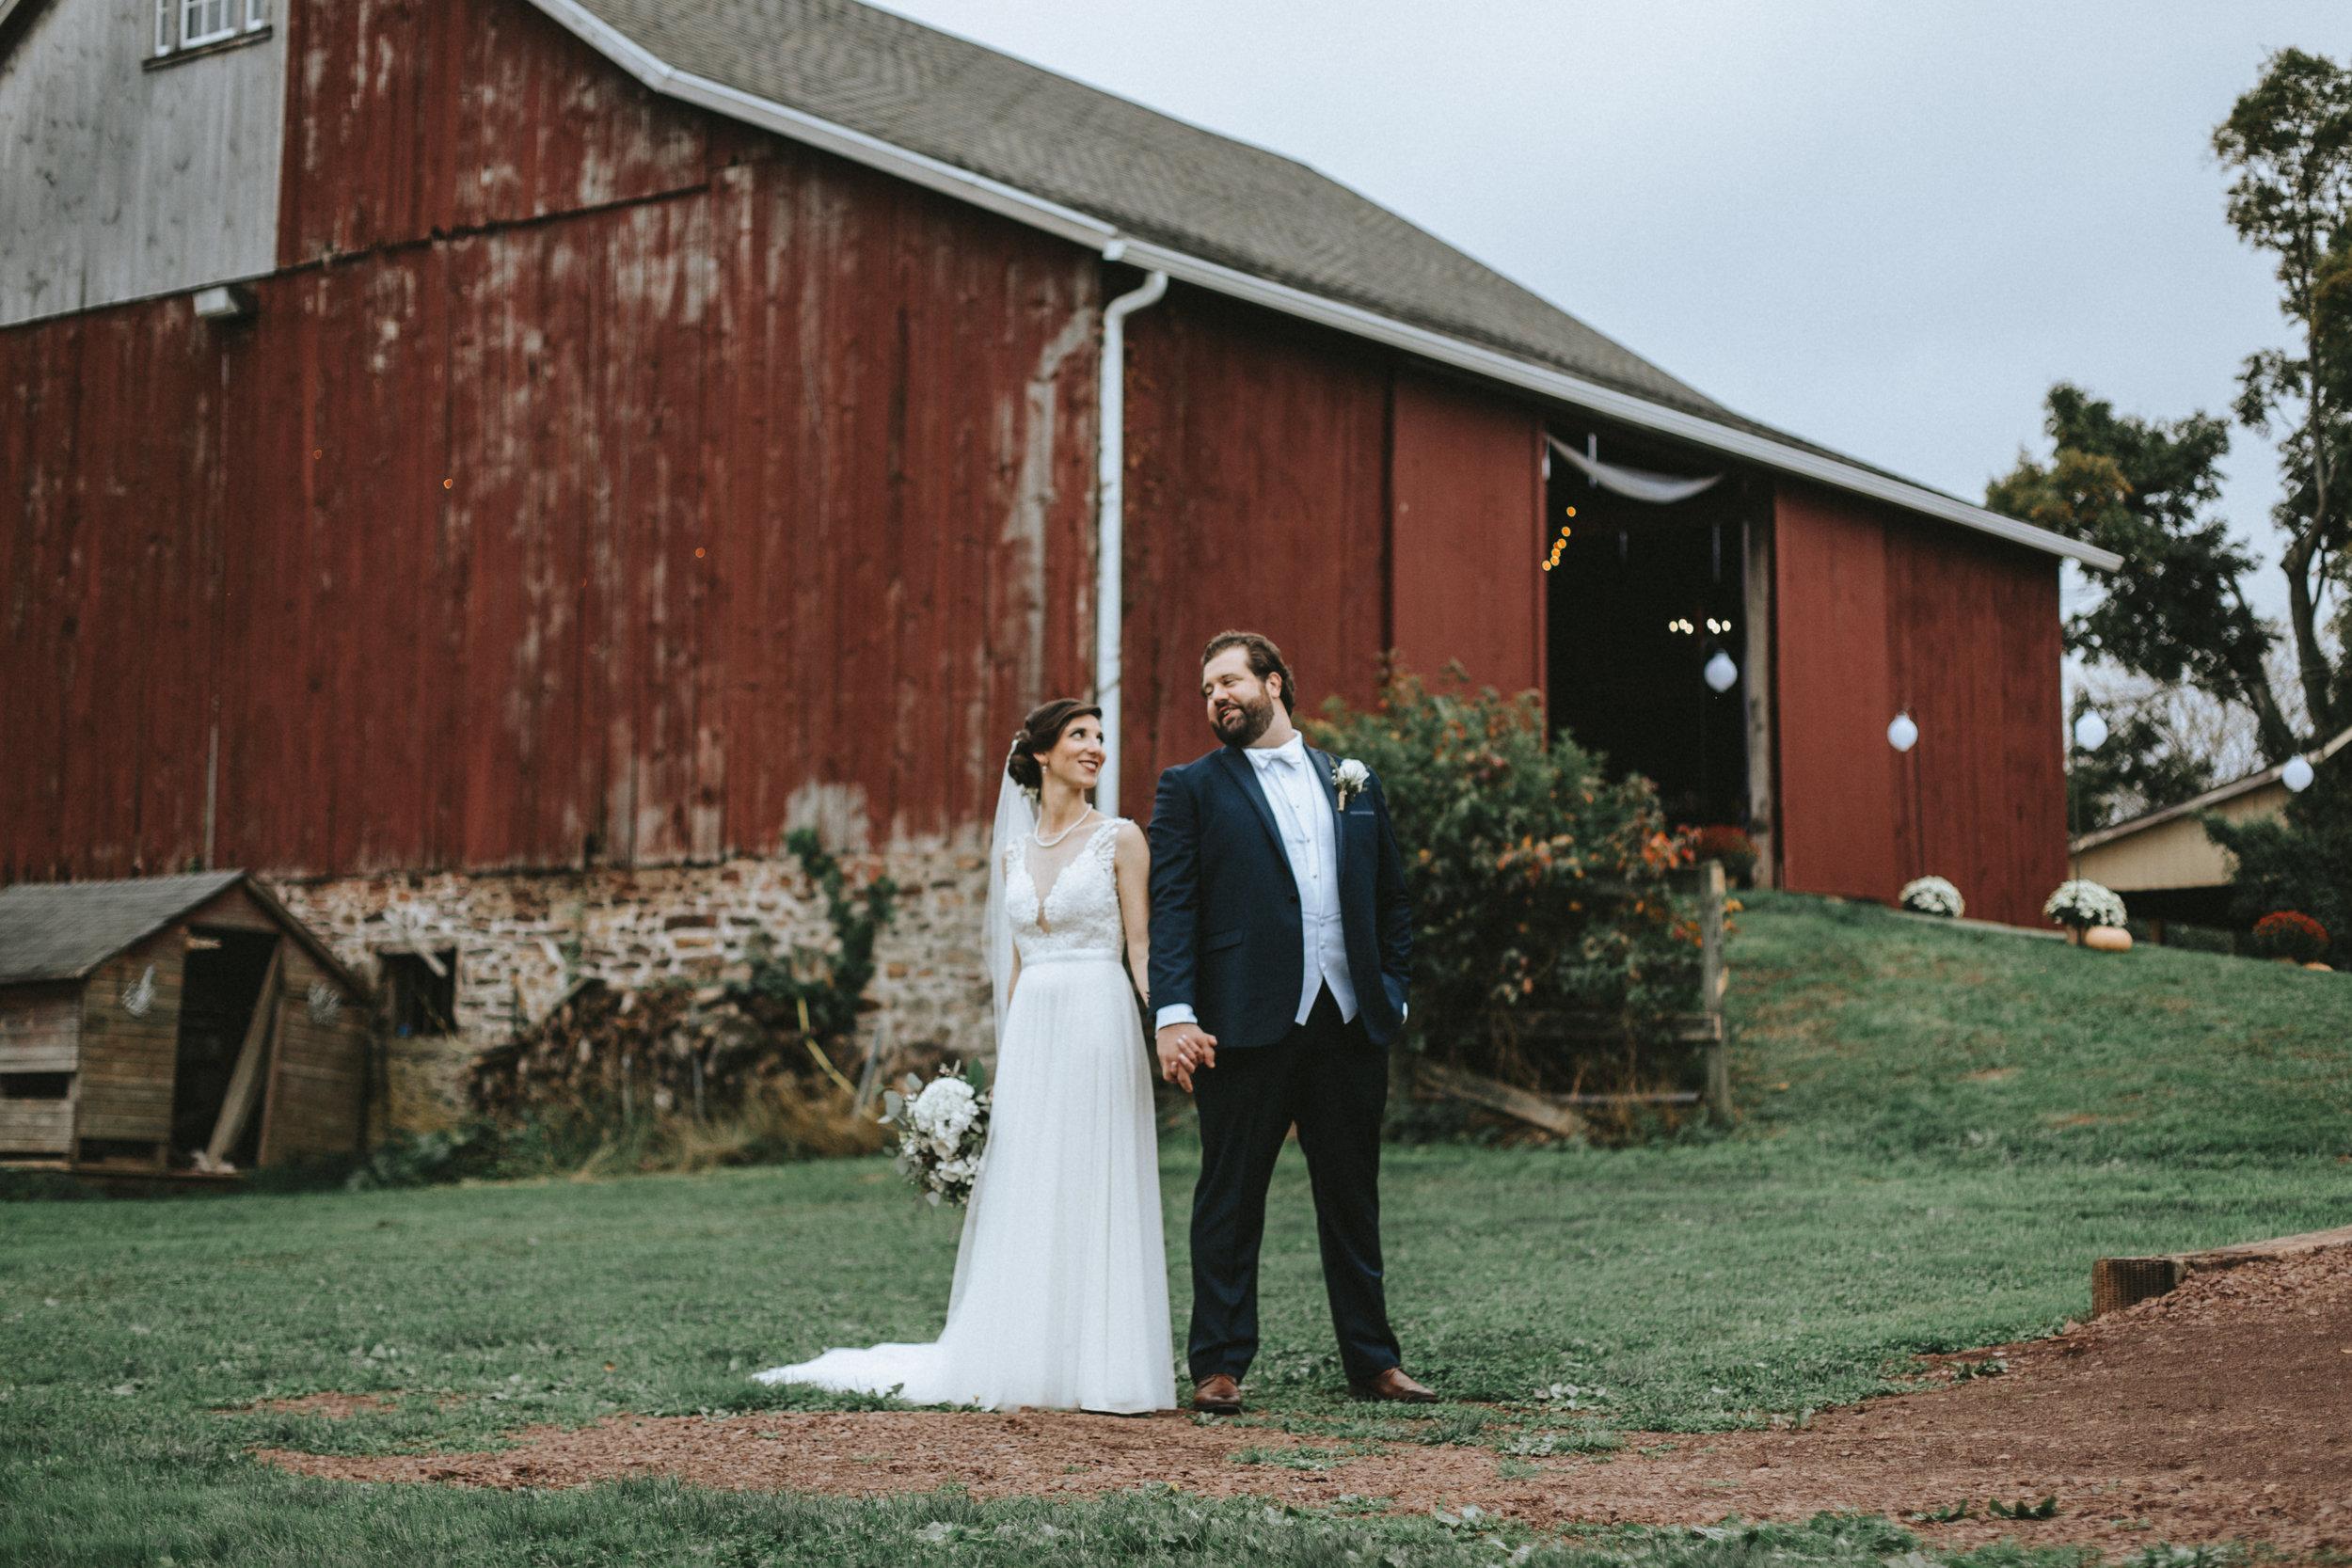 Twisted-Oaks-Studio-Arianne-Sean-Wedding-269.jpg